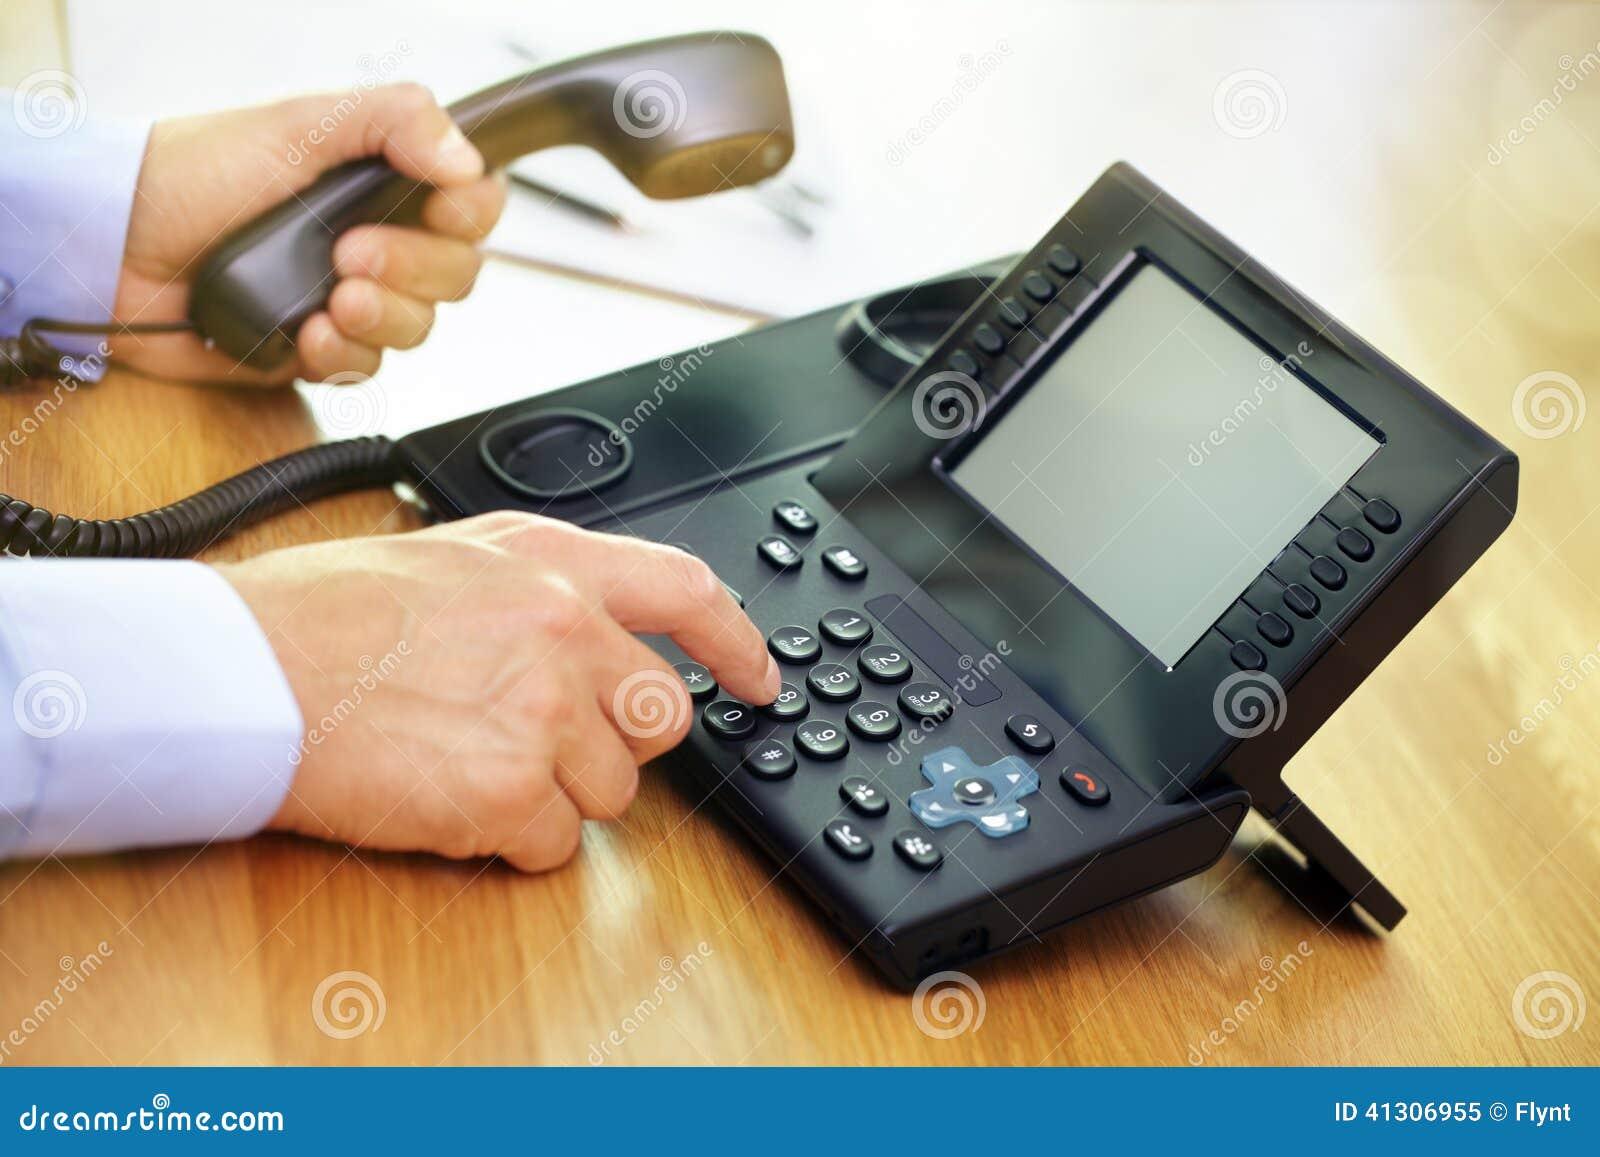 dialing telephone keypad stock photo image 41306955. Black Bedroom Furniture Sets. Home Design Ideas